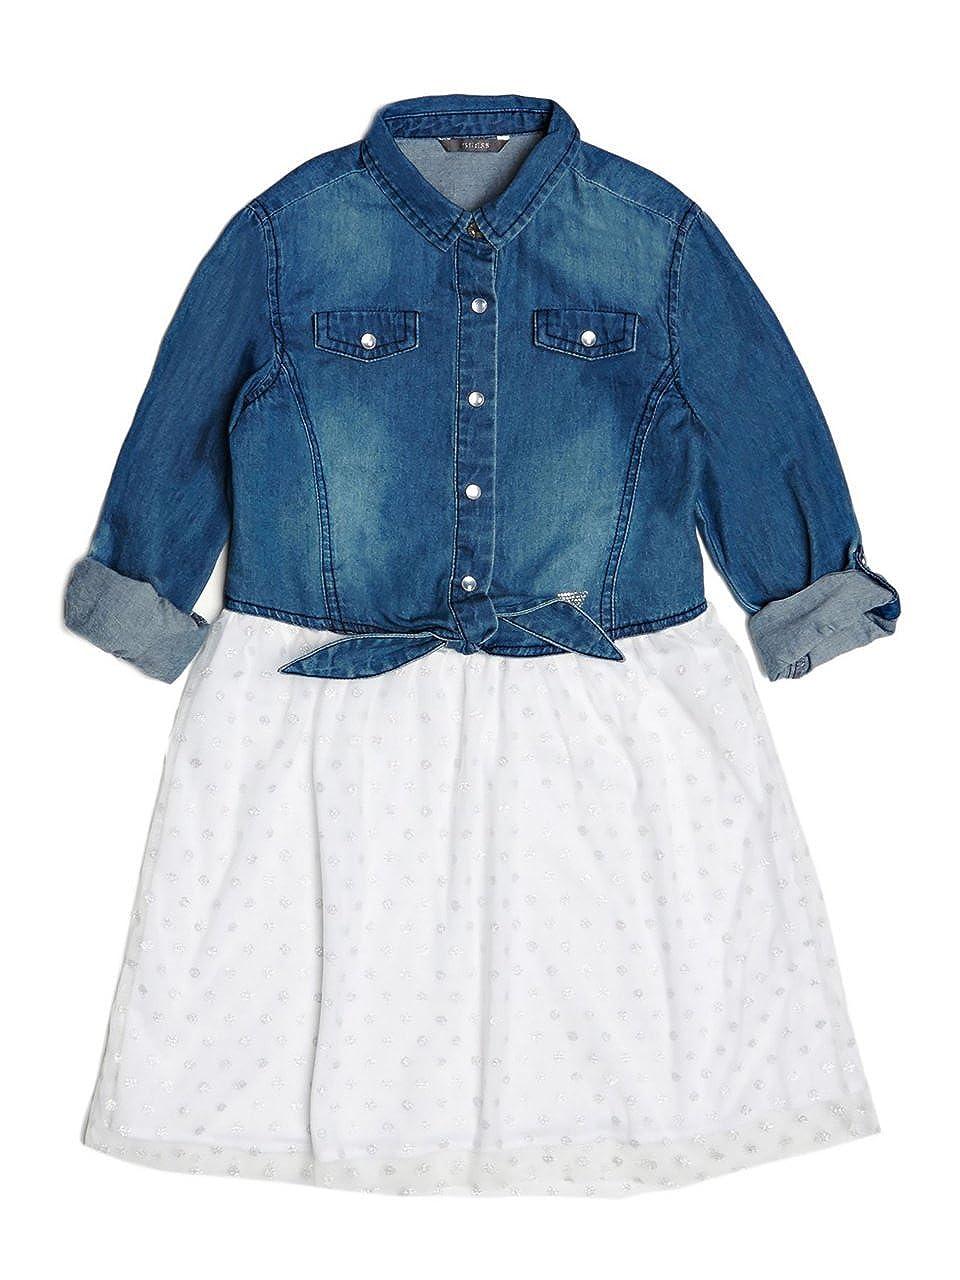 GUESS Chambray Two-Fer Dress (7-14)